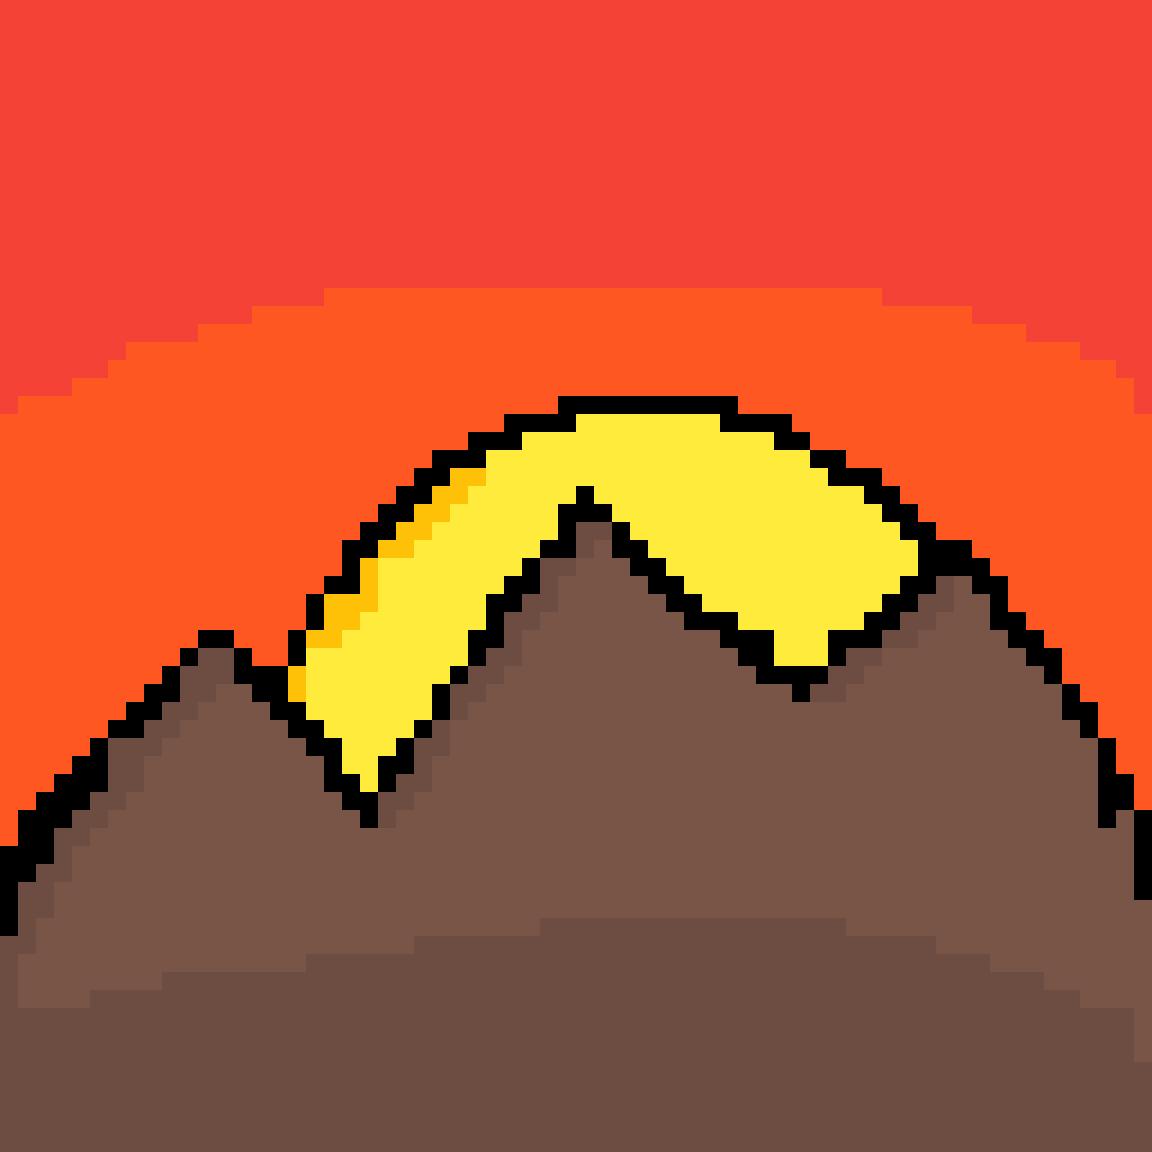 Sunset by HuskyGamer